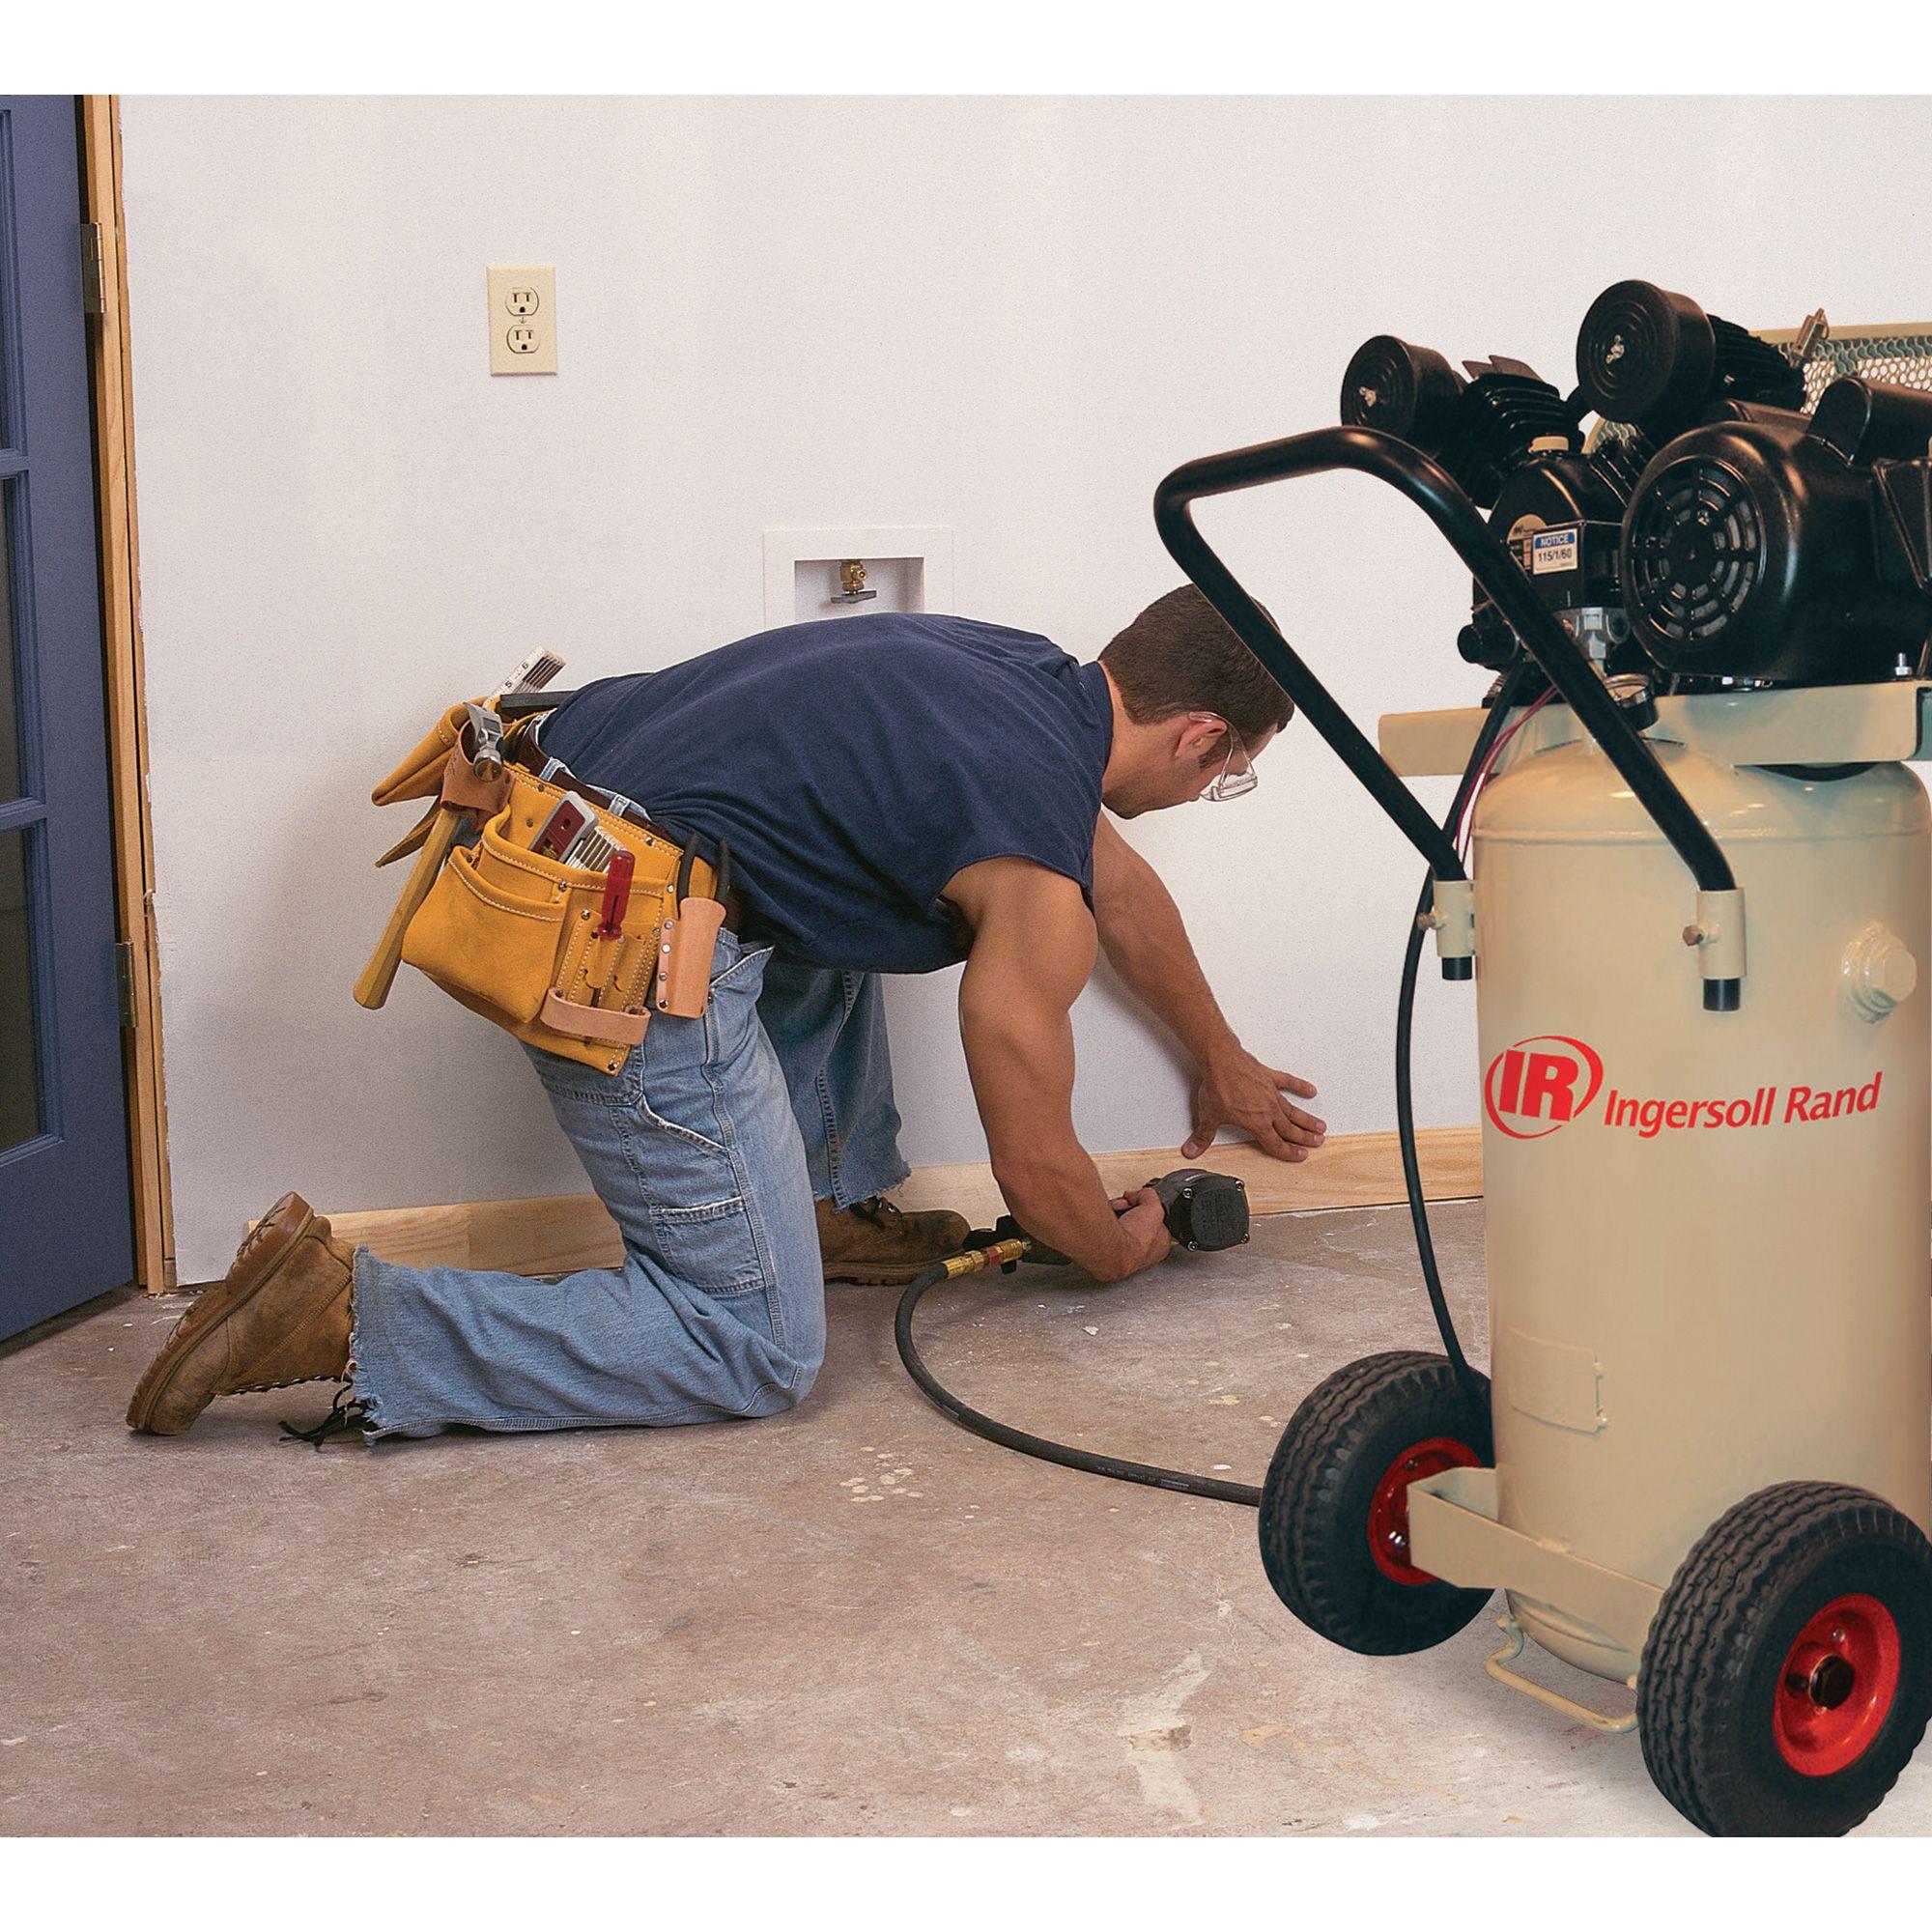 Ingersoll Rand Garage Mate Portable Electric Air